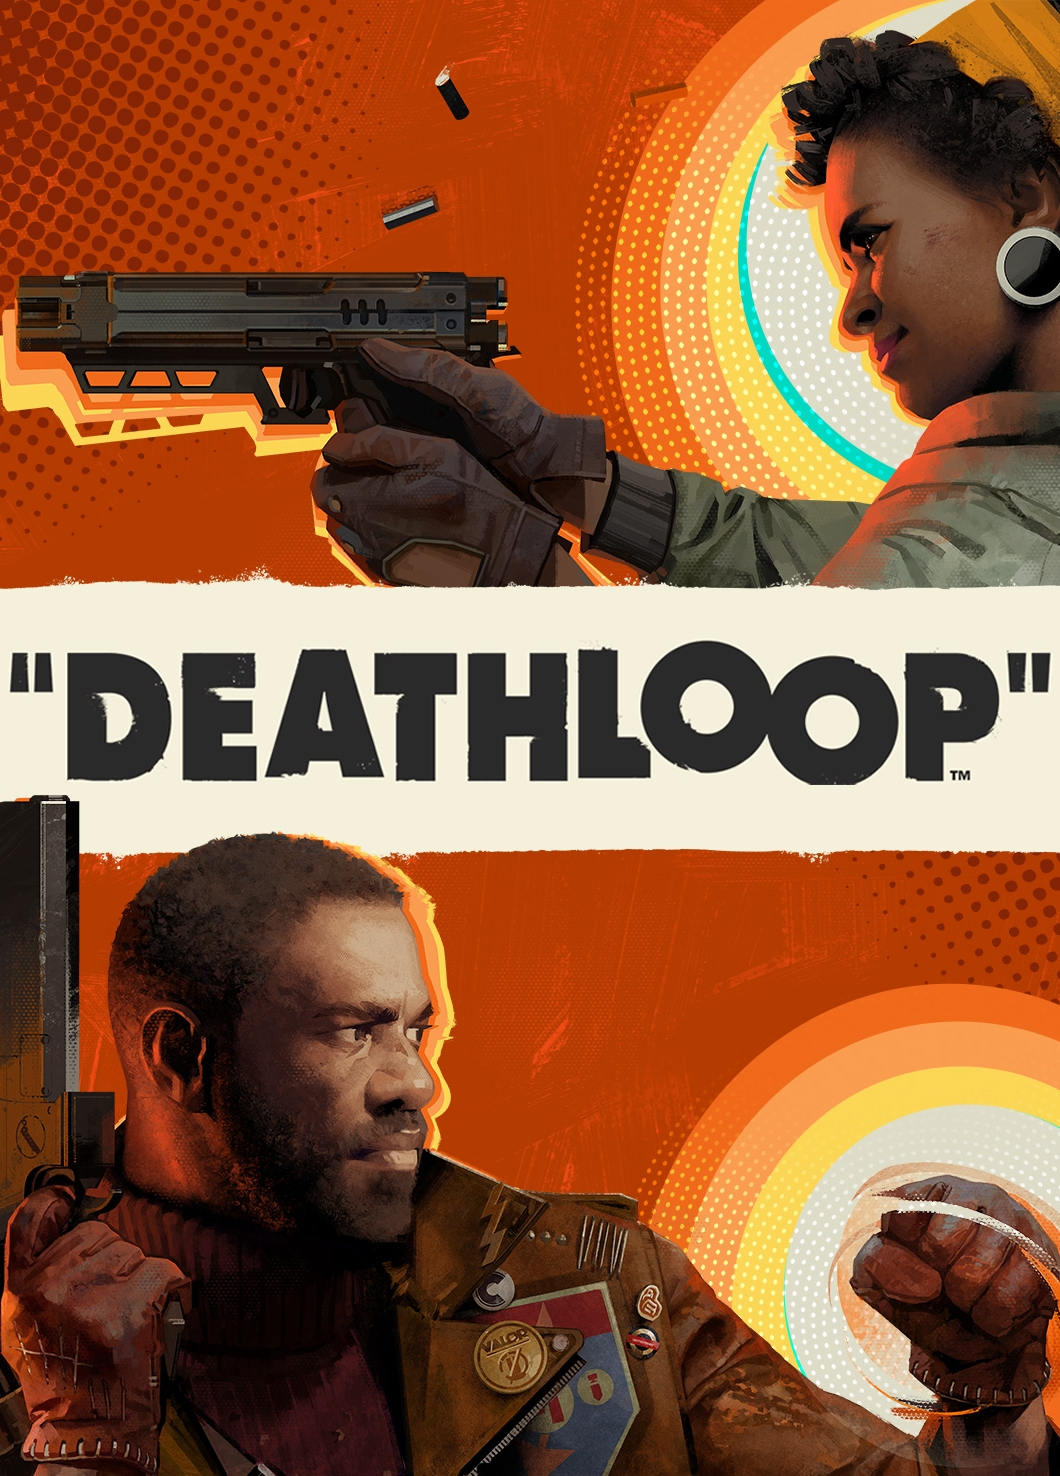 DEATHLOOP DIGITAL DELUXE ✅(Steam Ключ)+ПОДАРОК